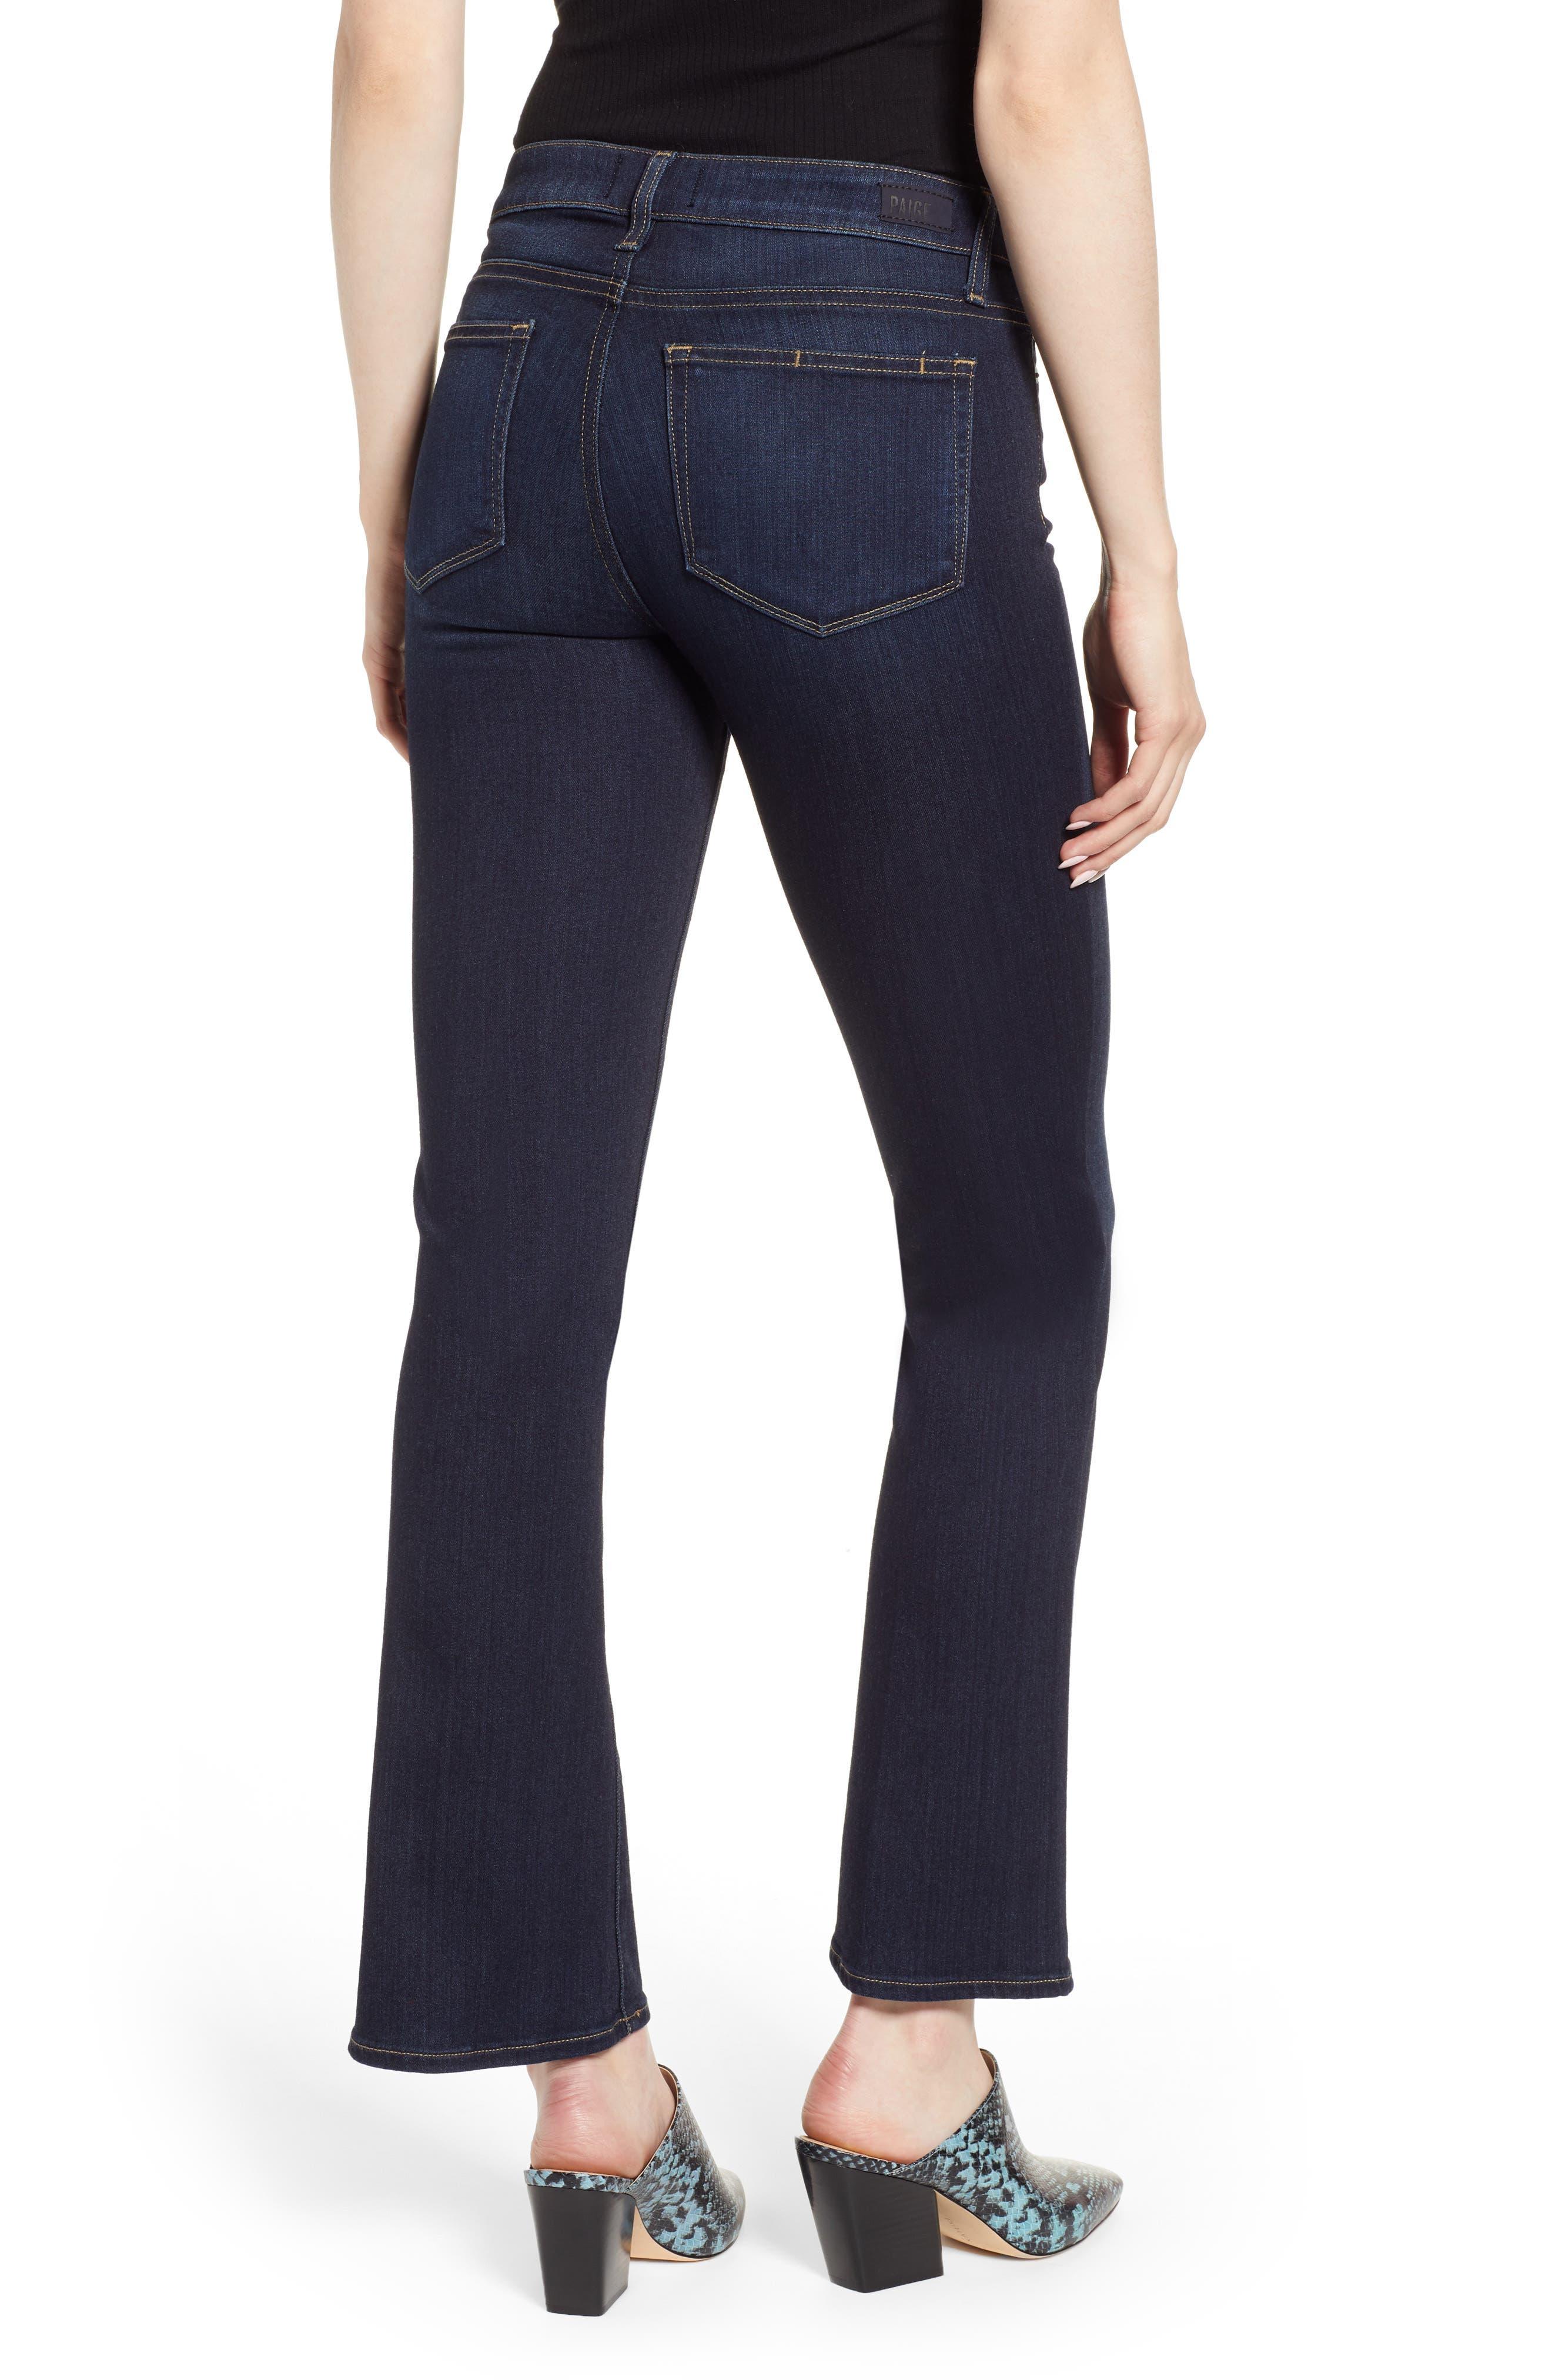 Transcend - Manhattan High Waist Bootcut Jeans,                             Alternate thumbnail 2, color,                             SANIA